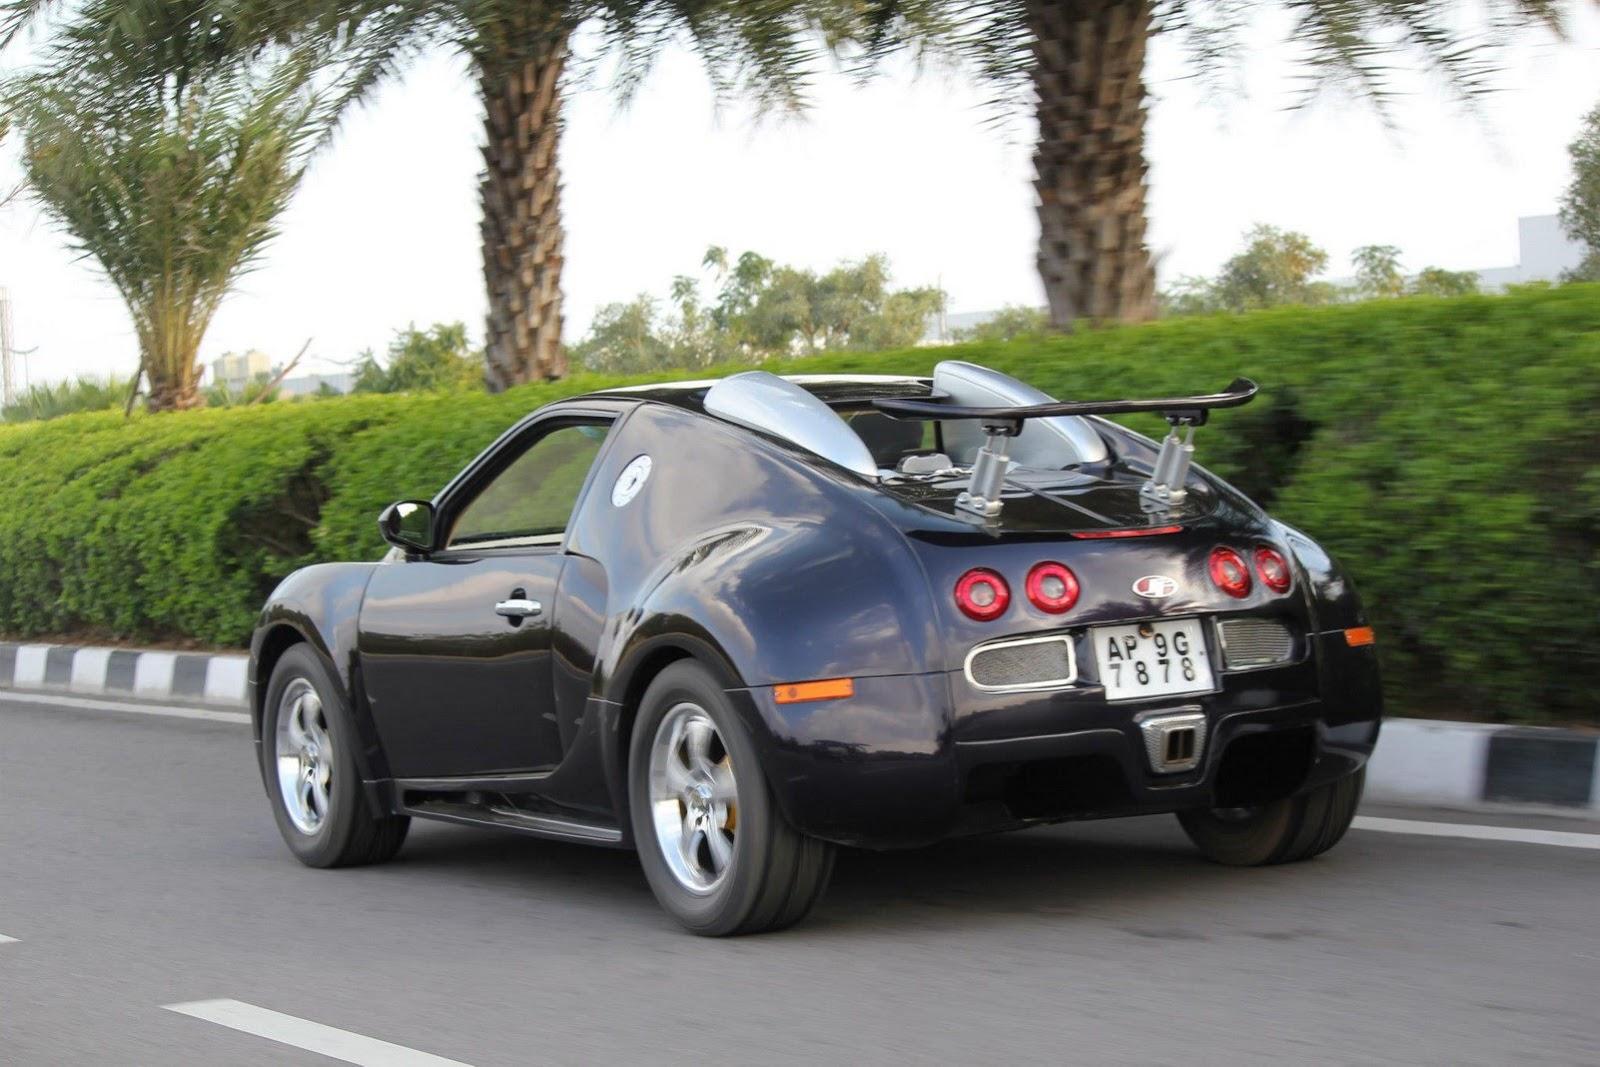 Docar-s: Mini-Me Bugatti Veyron Clone Built On A Suzuki